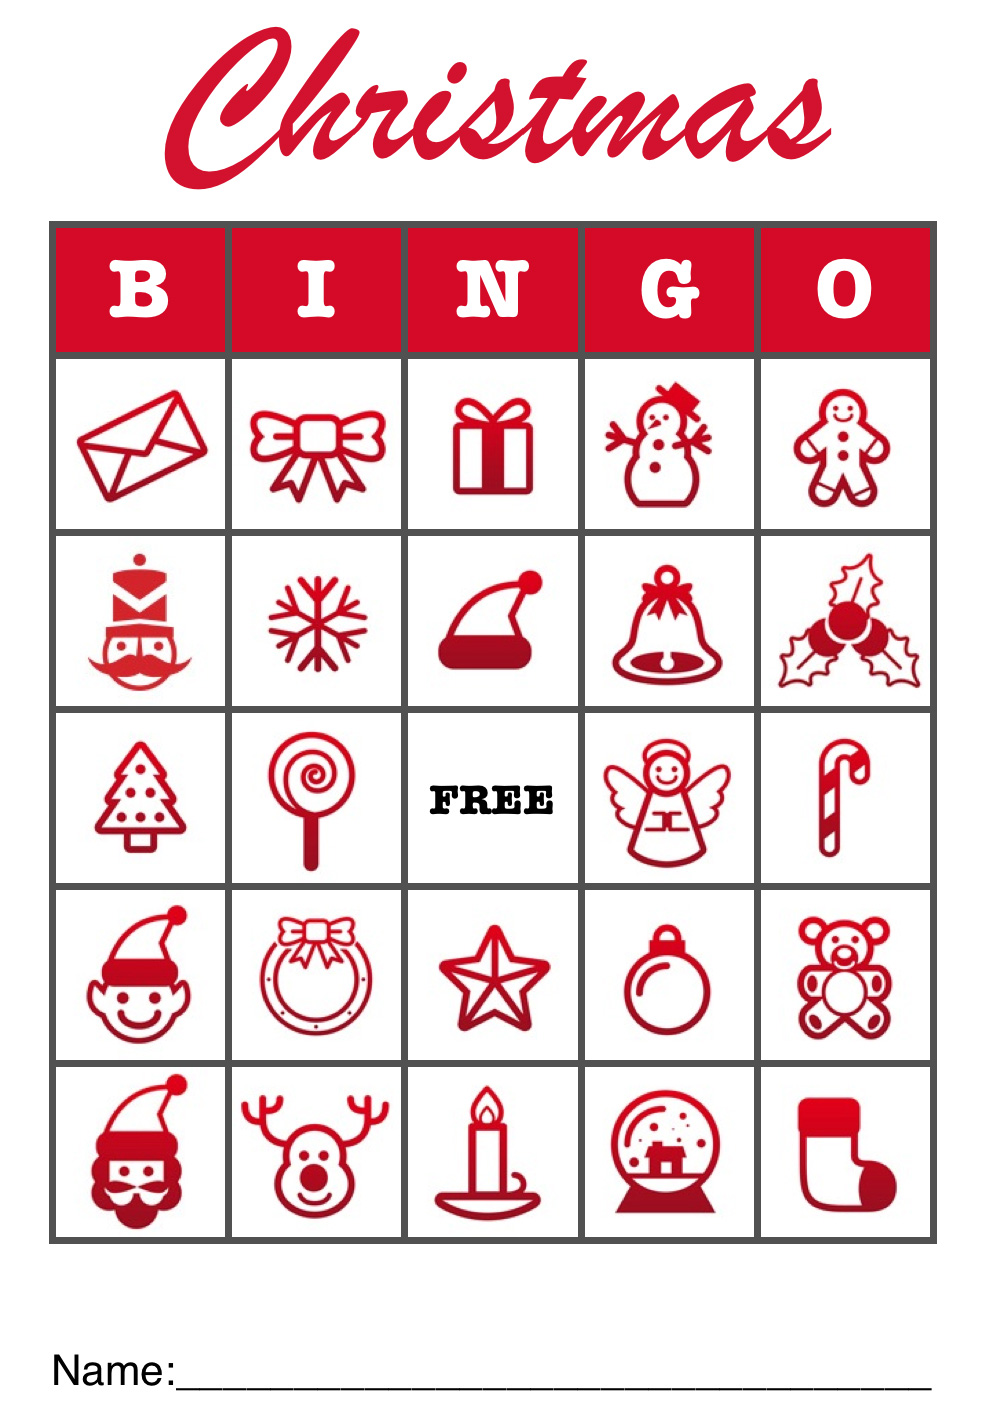 5 Images of Office Christmas Bingo Printable